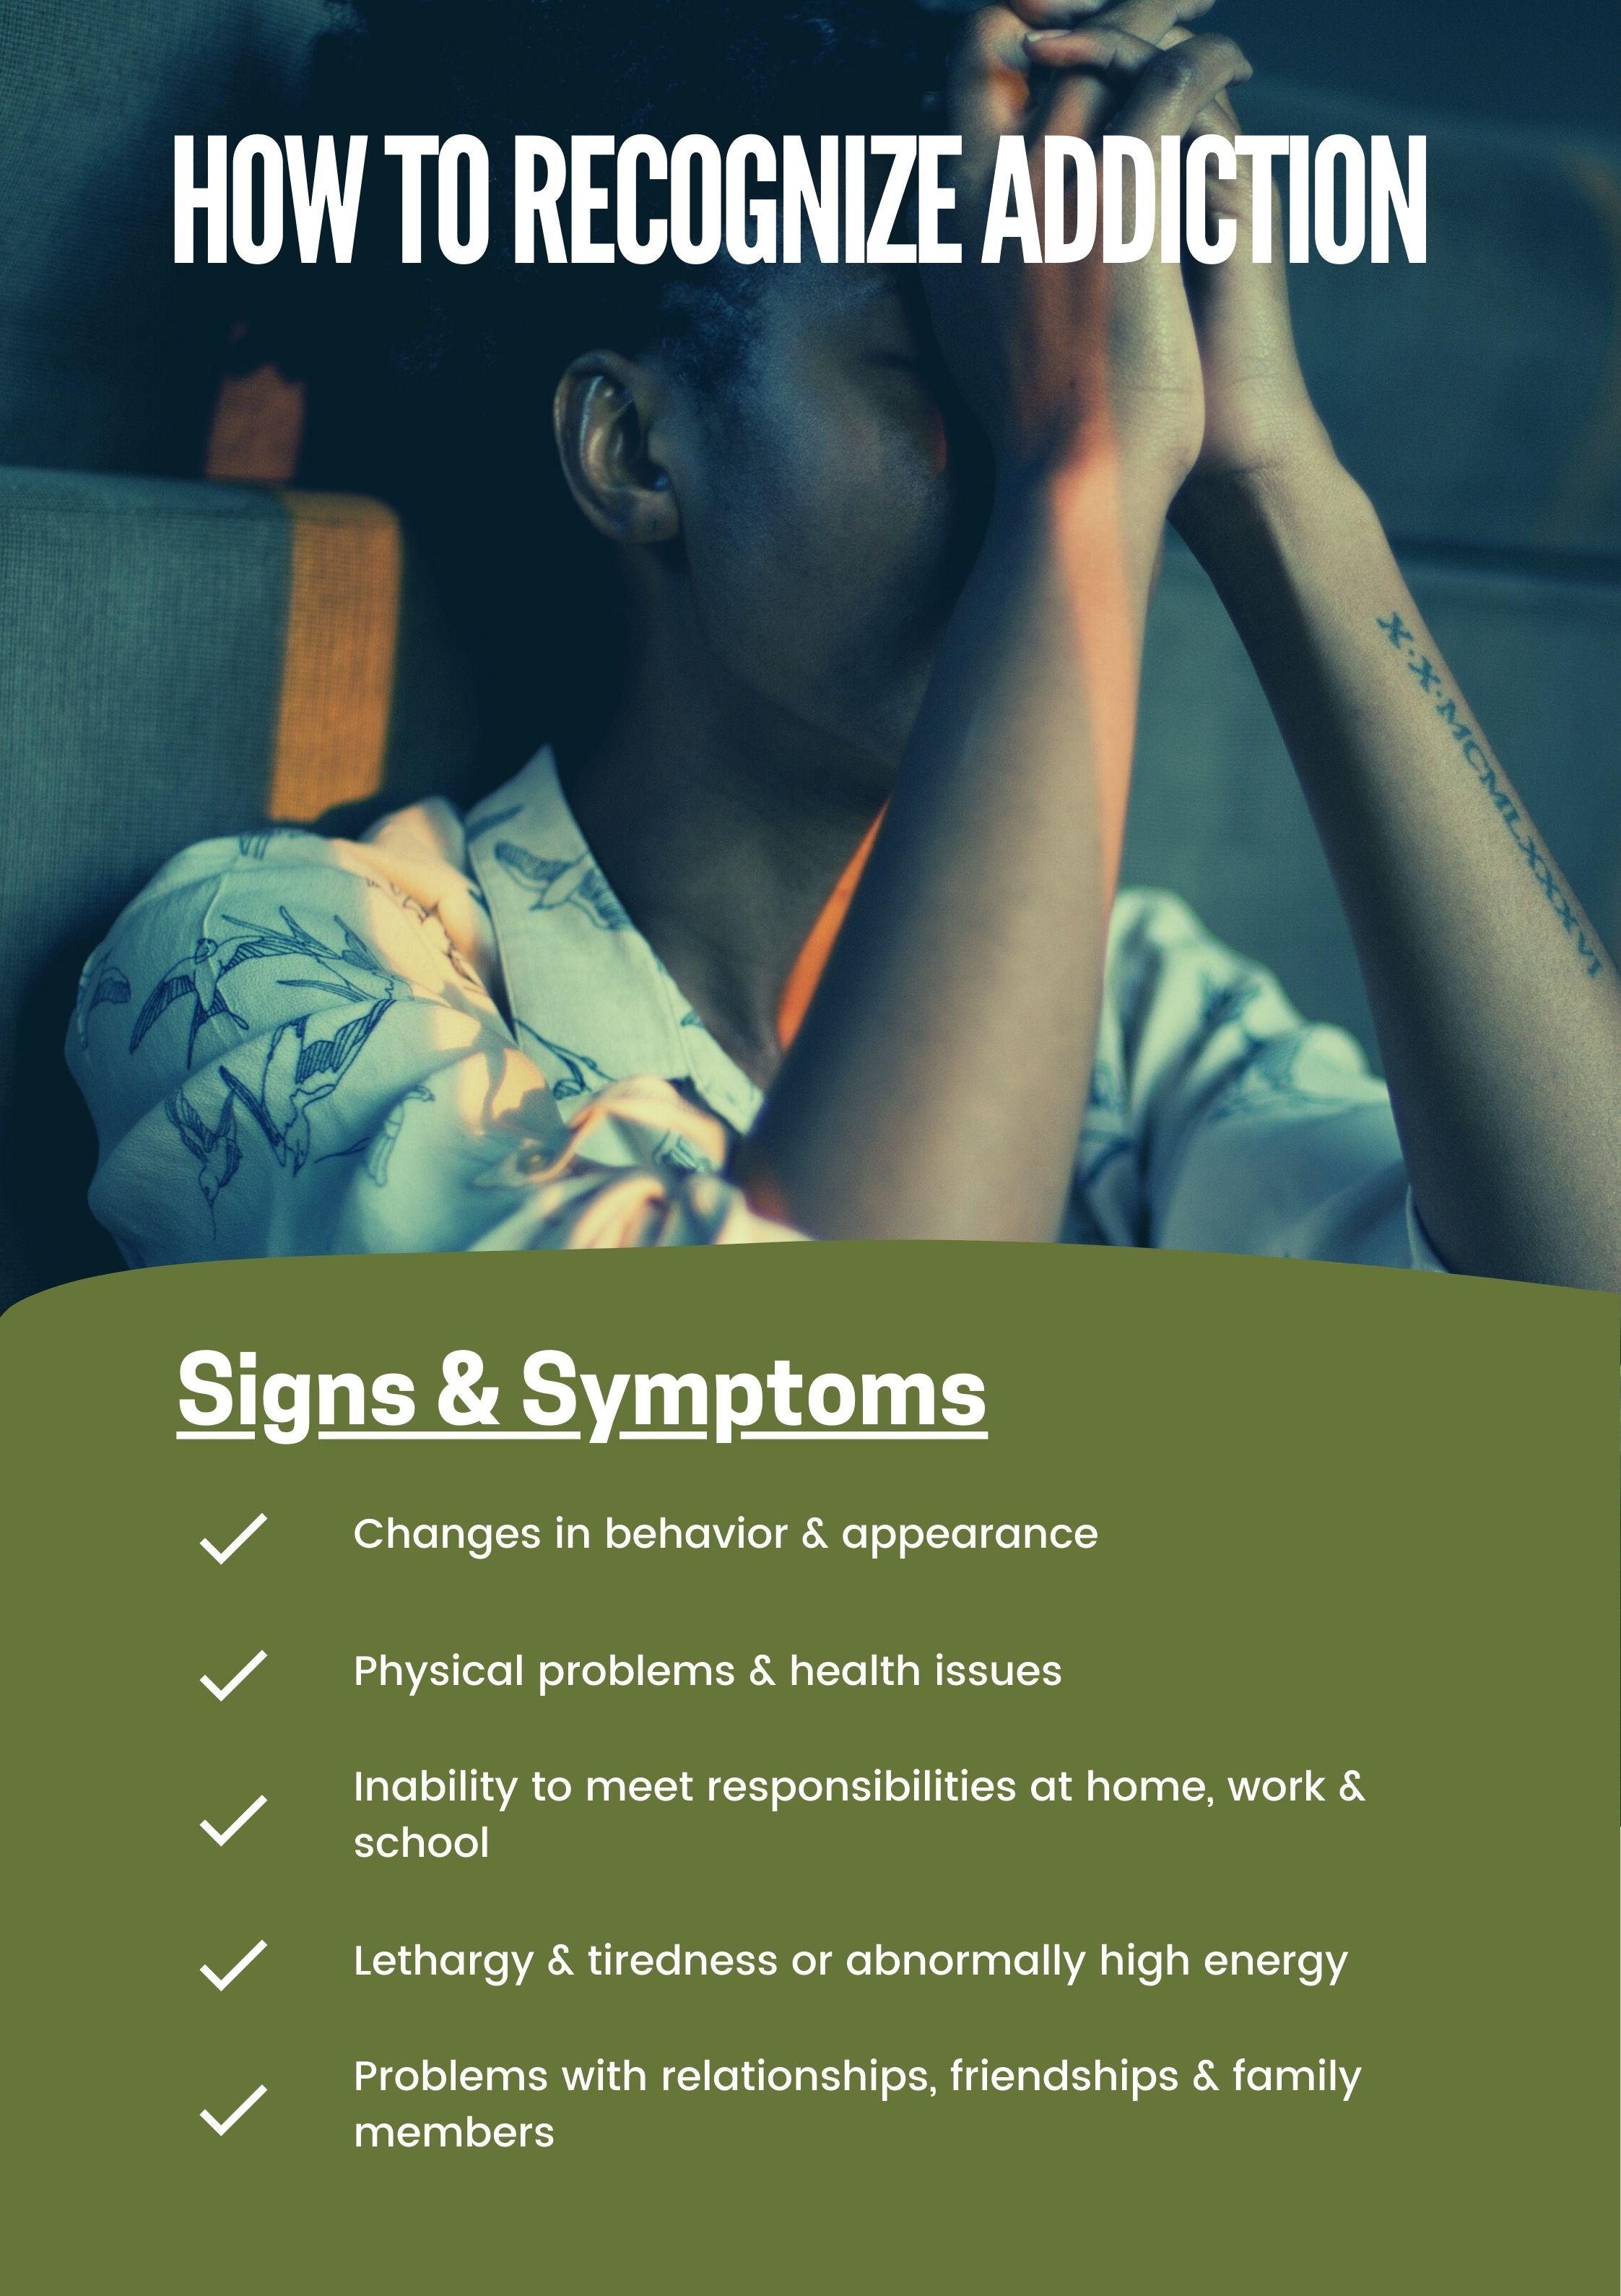 women addiction signs, symptoms of addiction in women